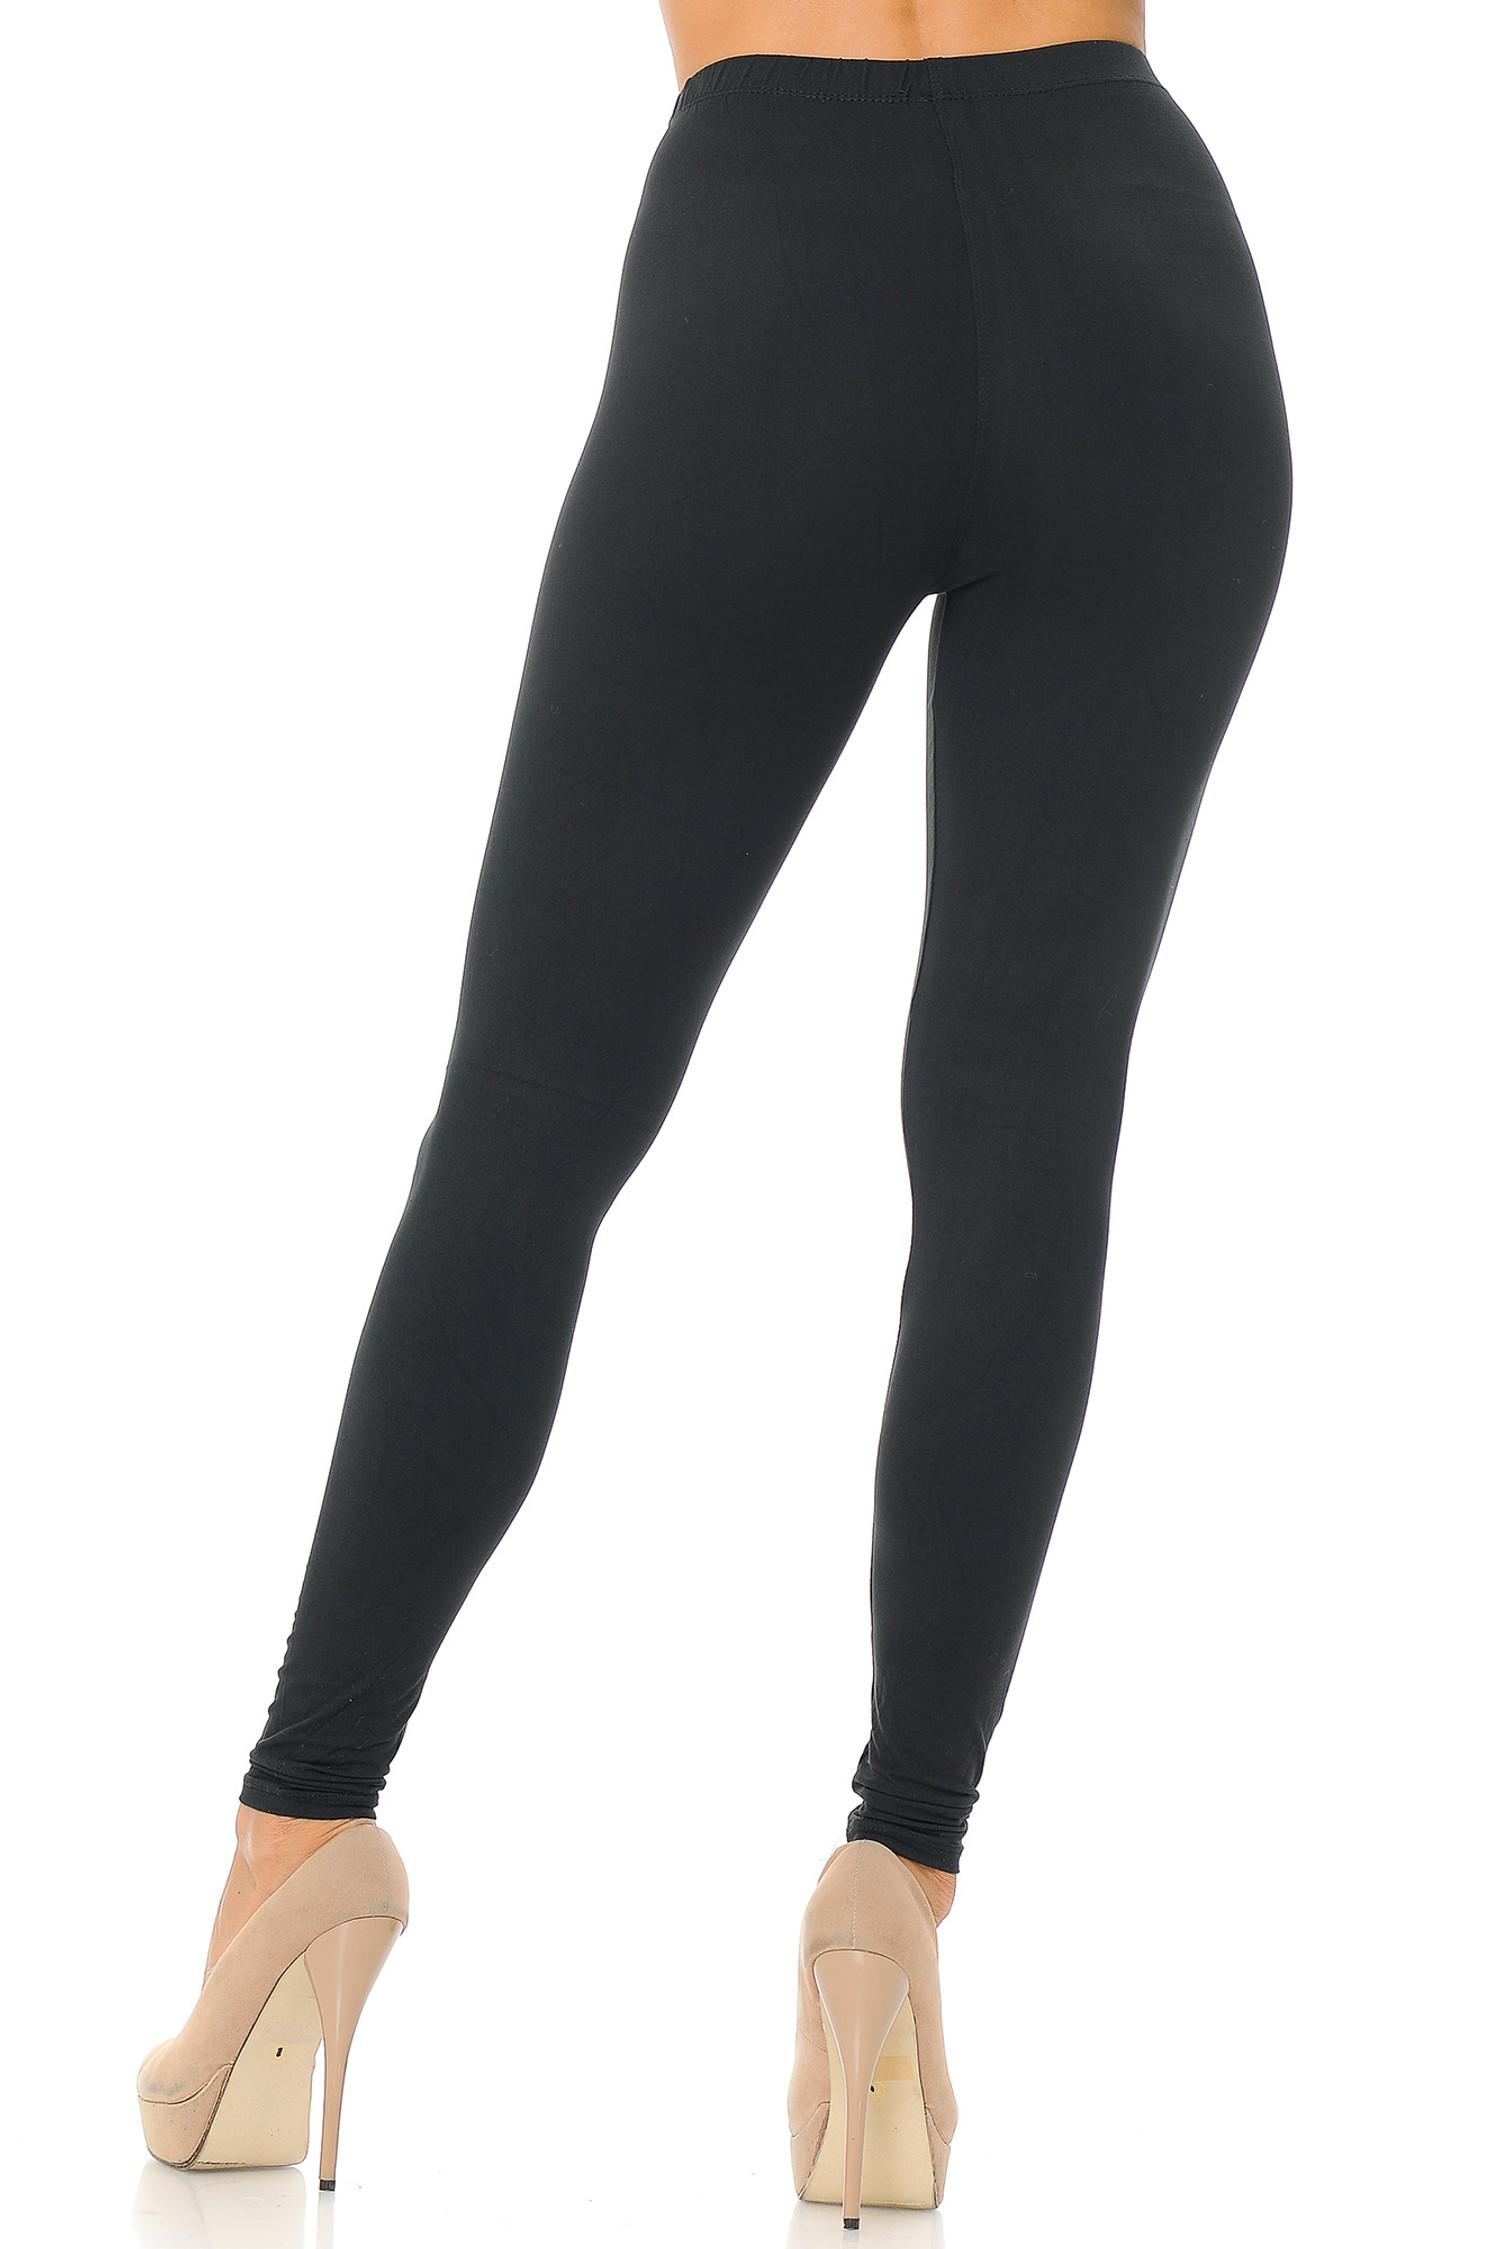 Black Back Brushed Basic Solid Leggings - EEVEE